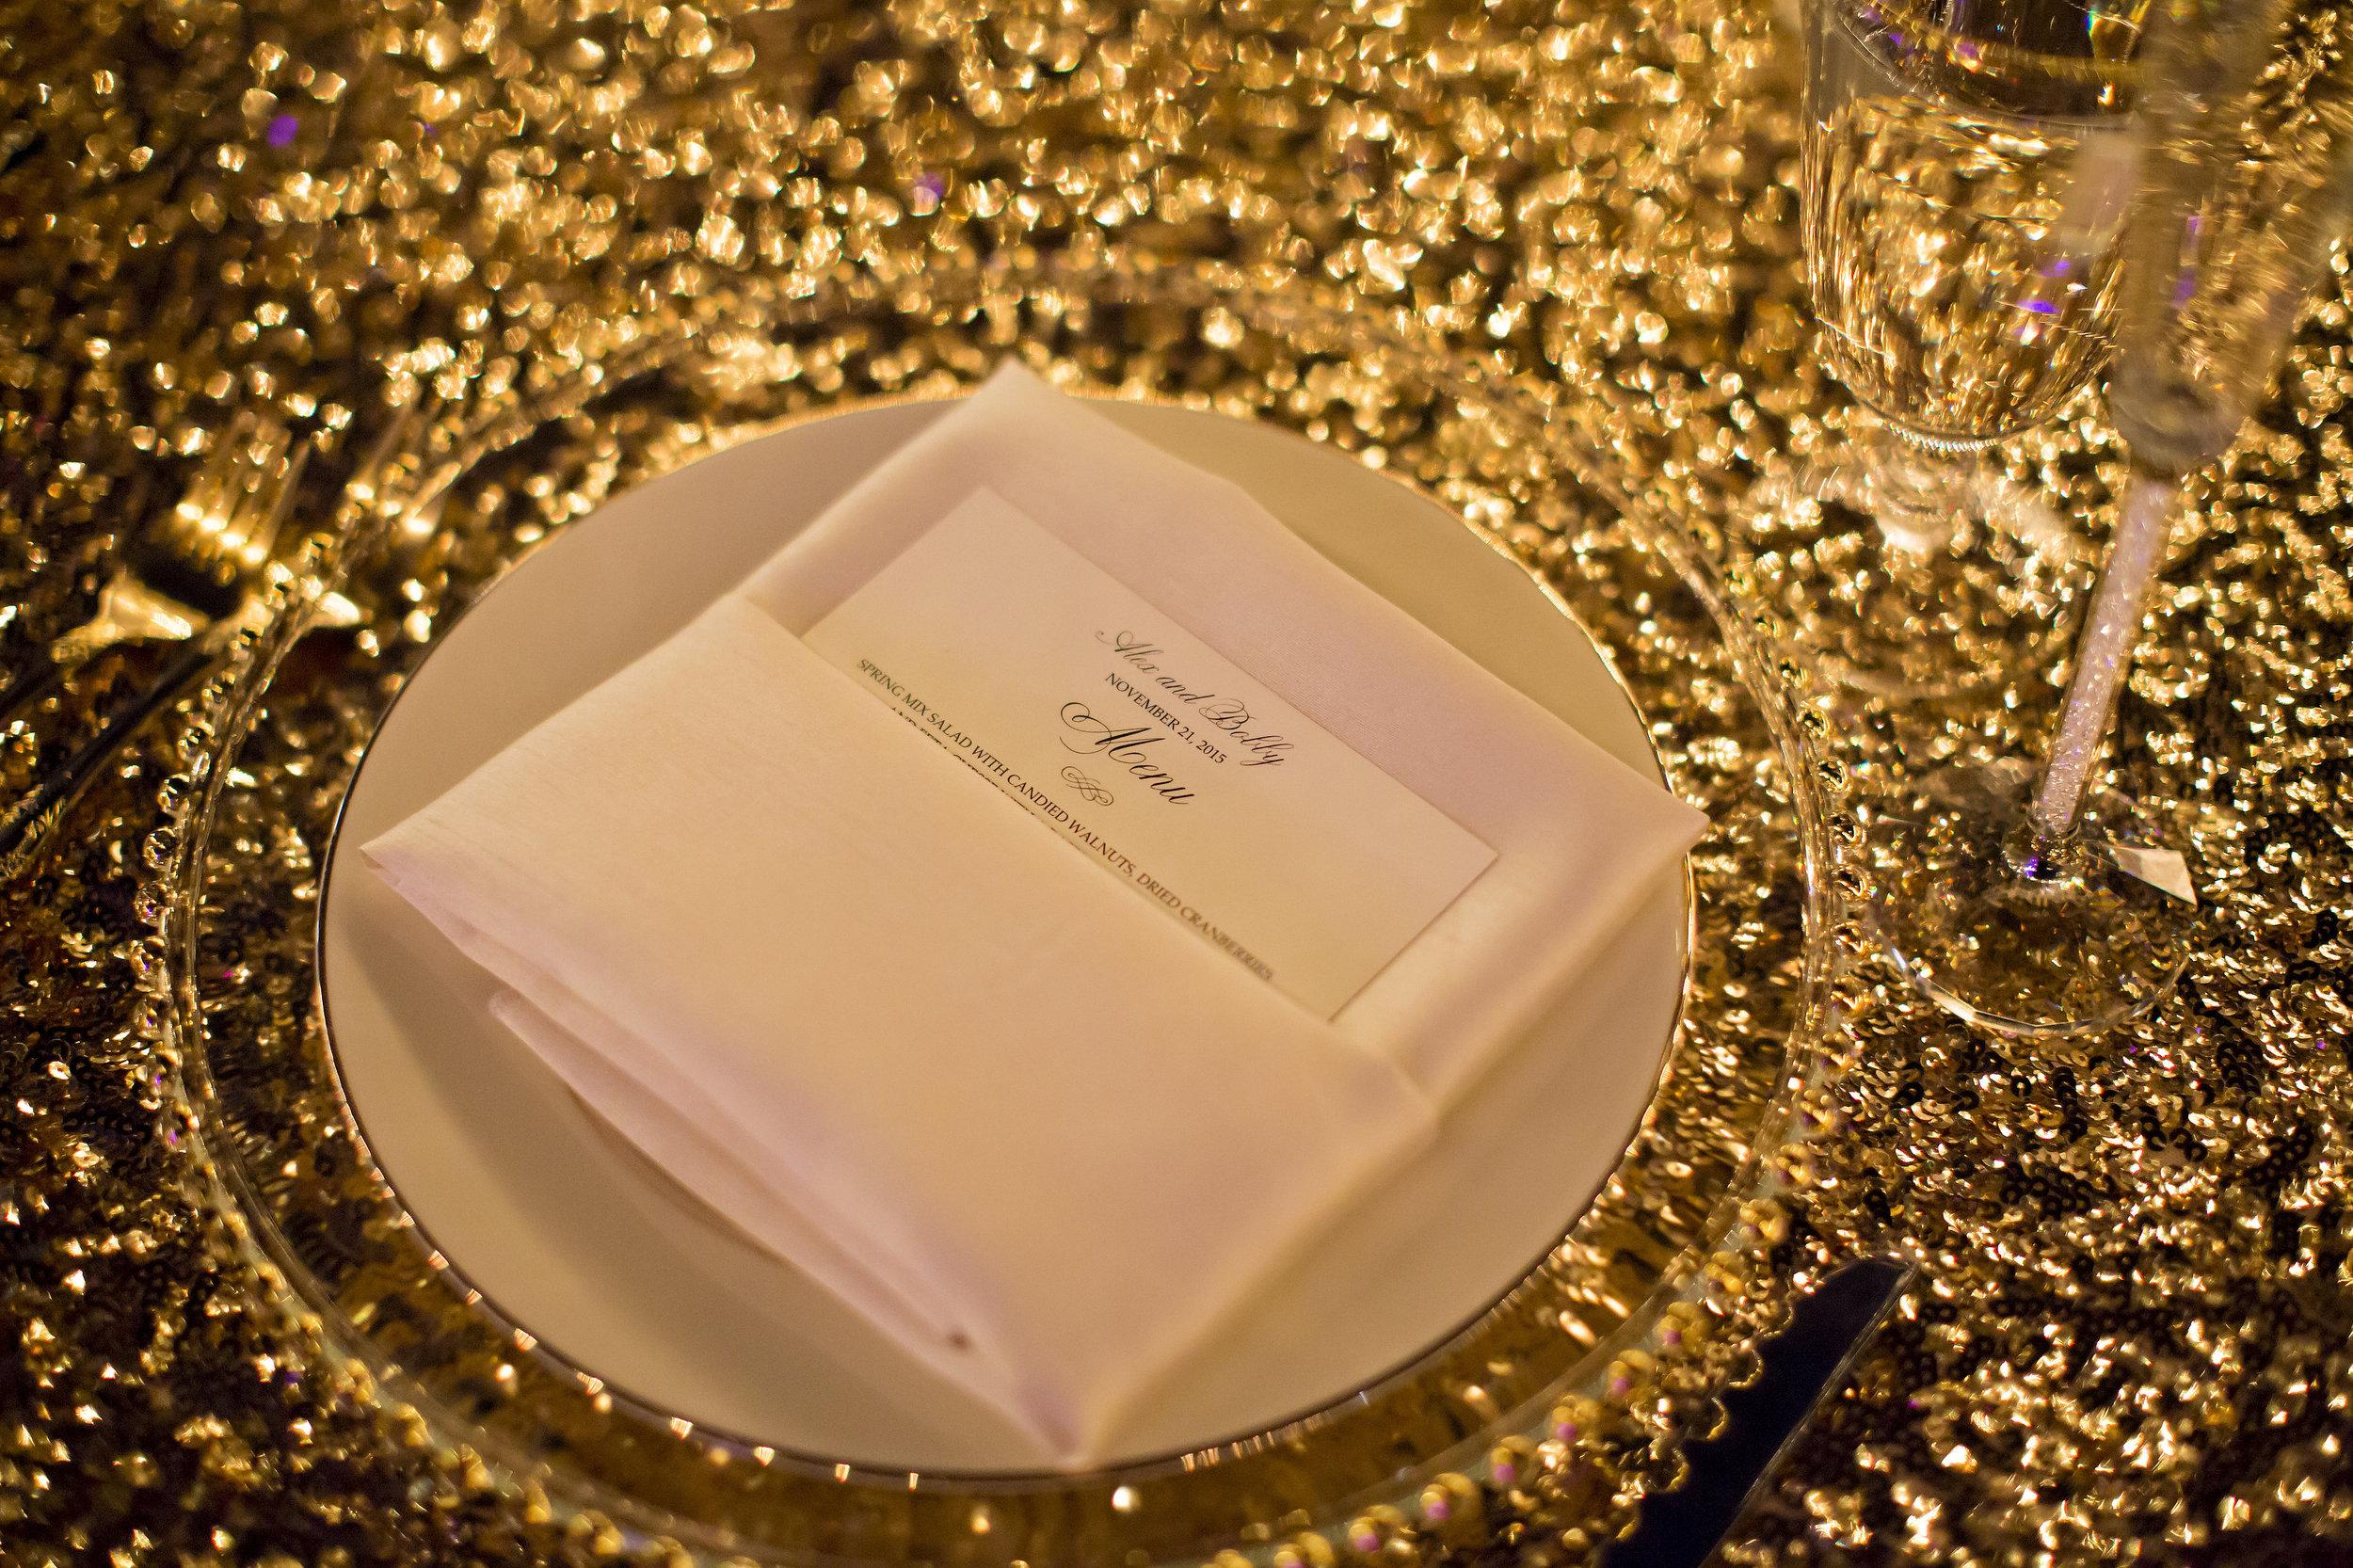 Gold Sequin and Blush Tablescape | Temecula Private Estate Wedding | Michelle Garibay Events